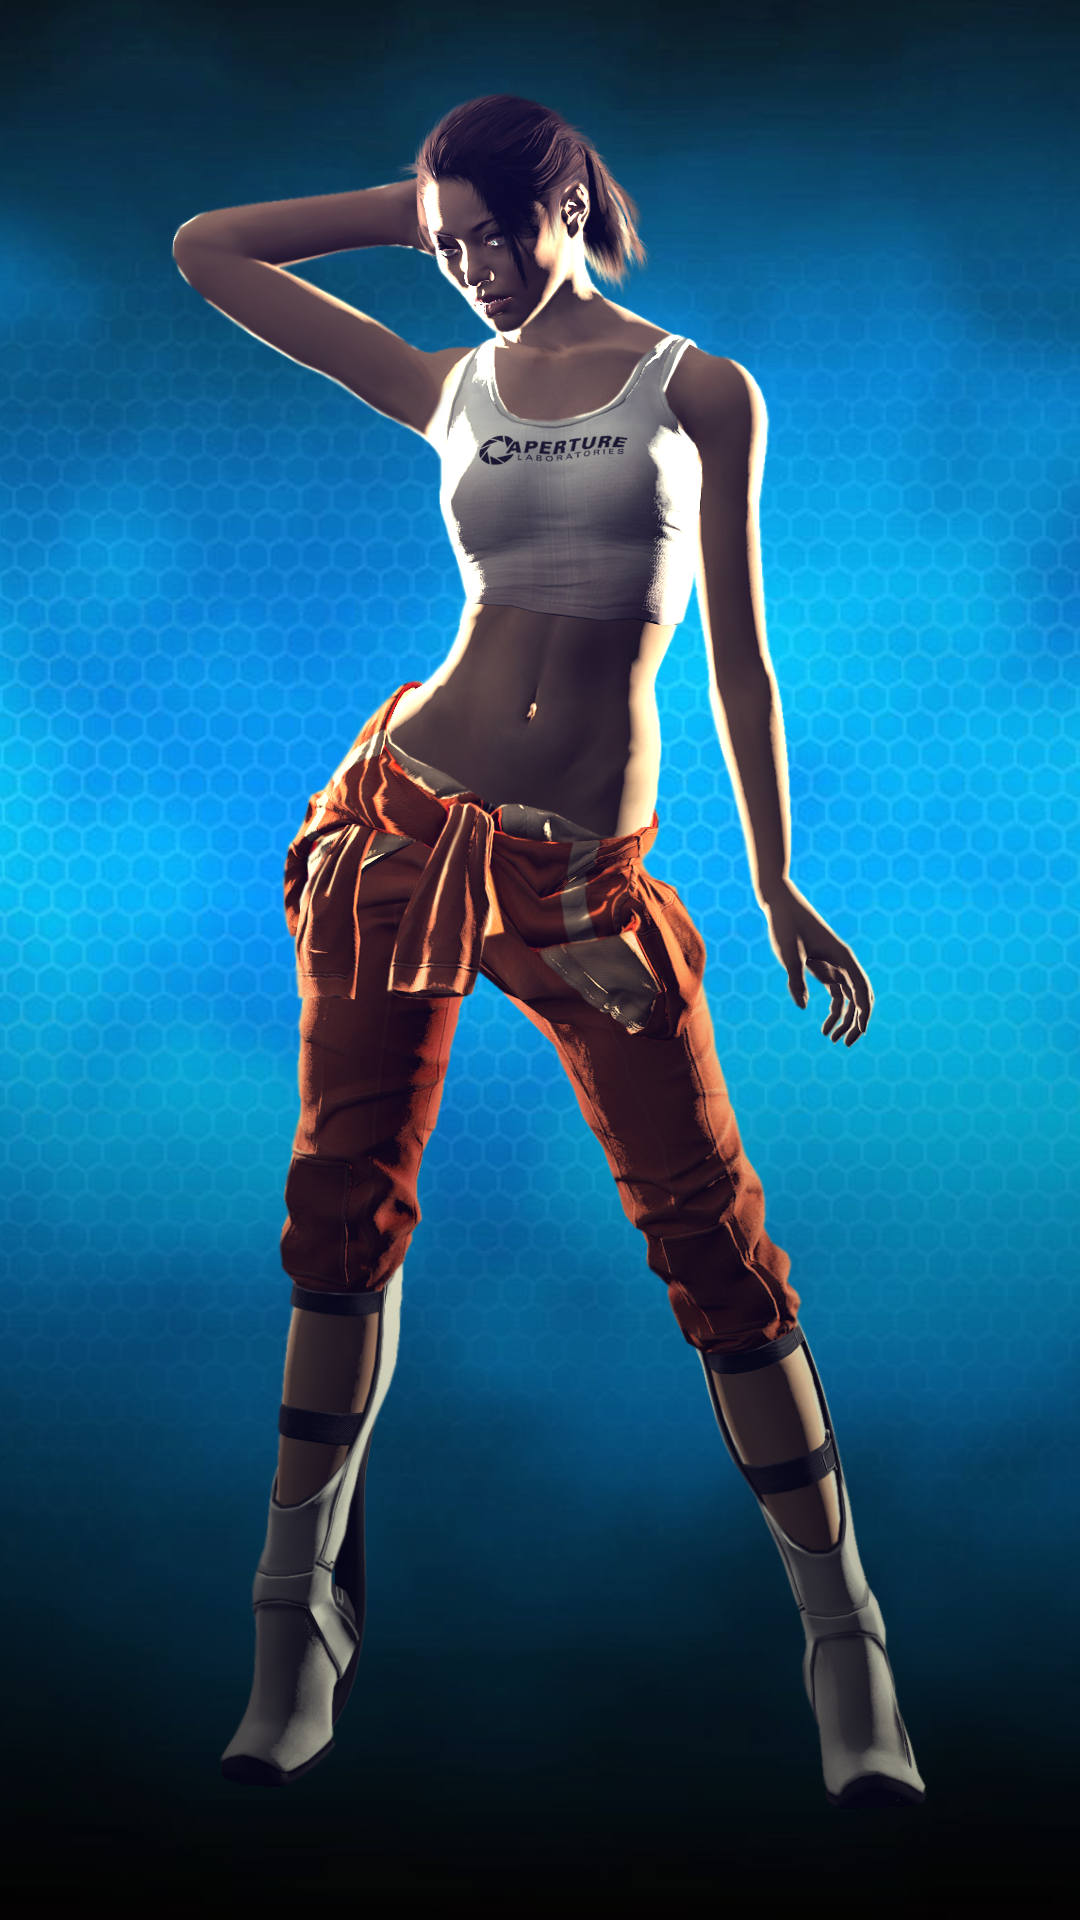 Portal 2 nude nude movies